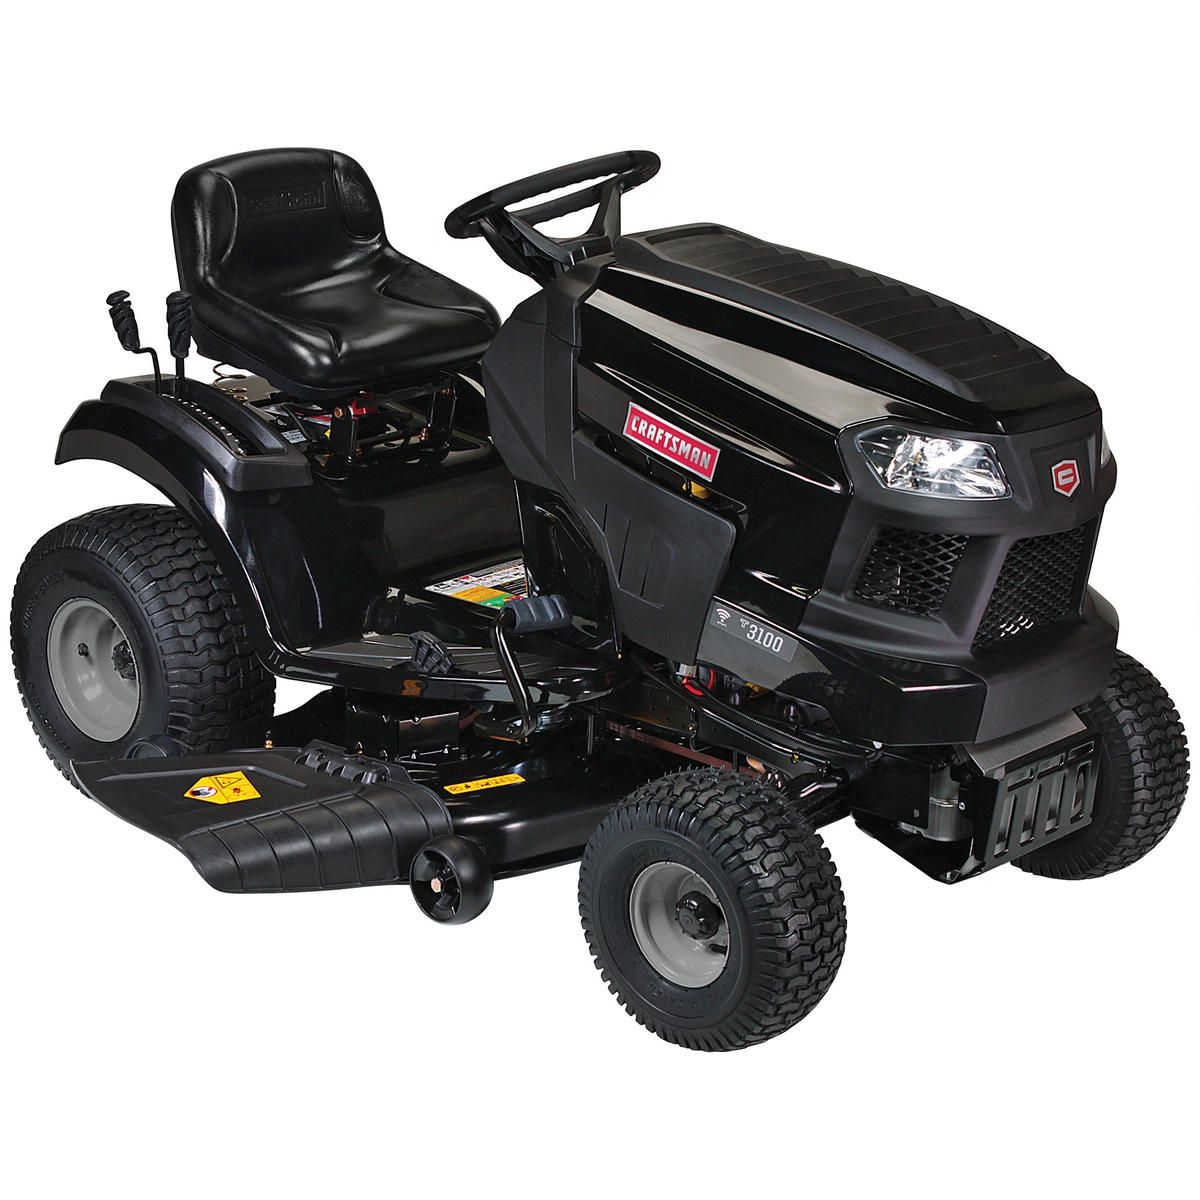 Craftsman 27334 54 24 Hp Briggs Stratton V Twin Riding Mower